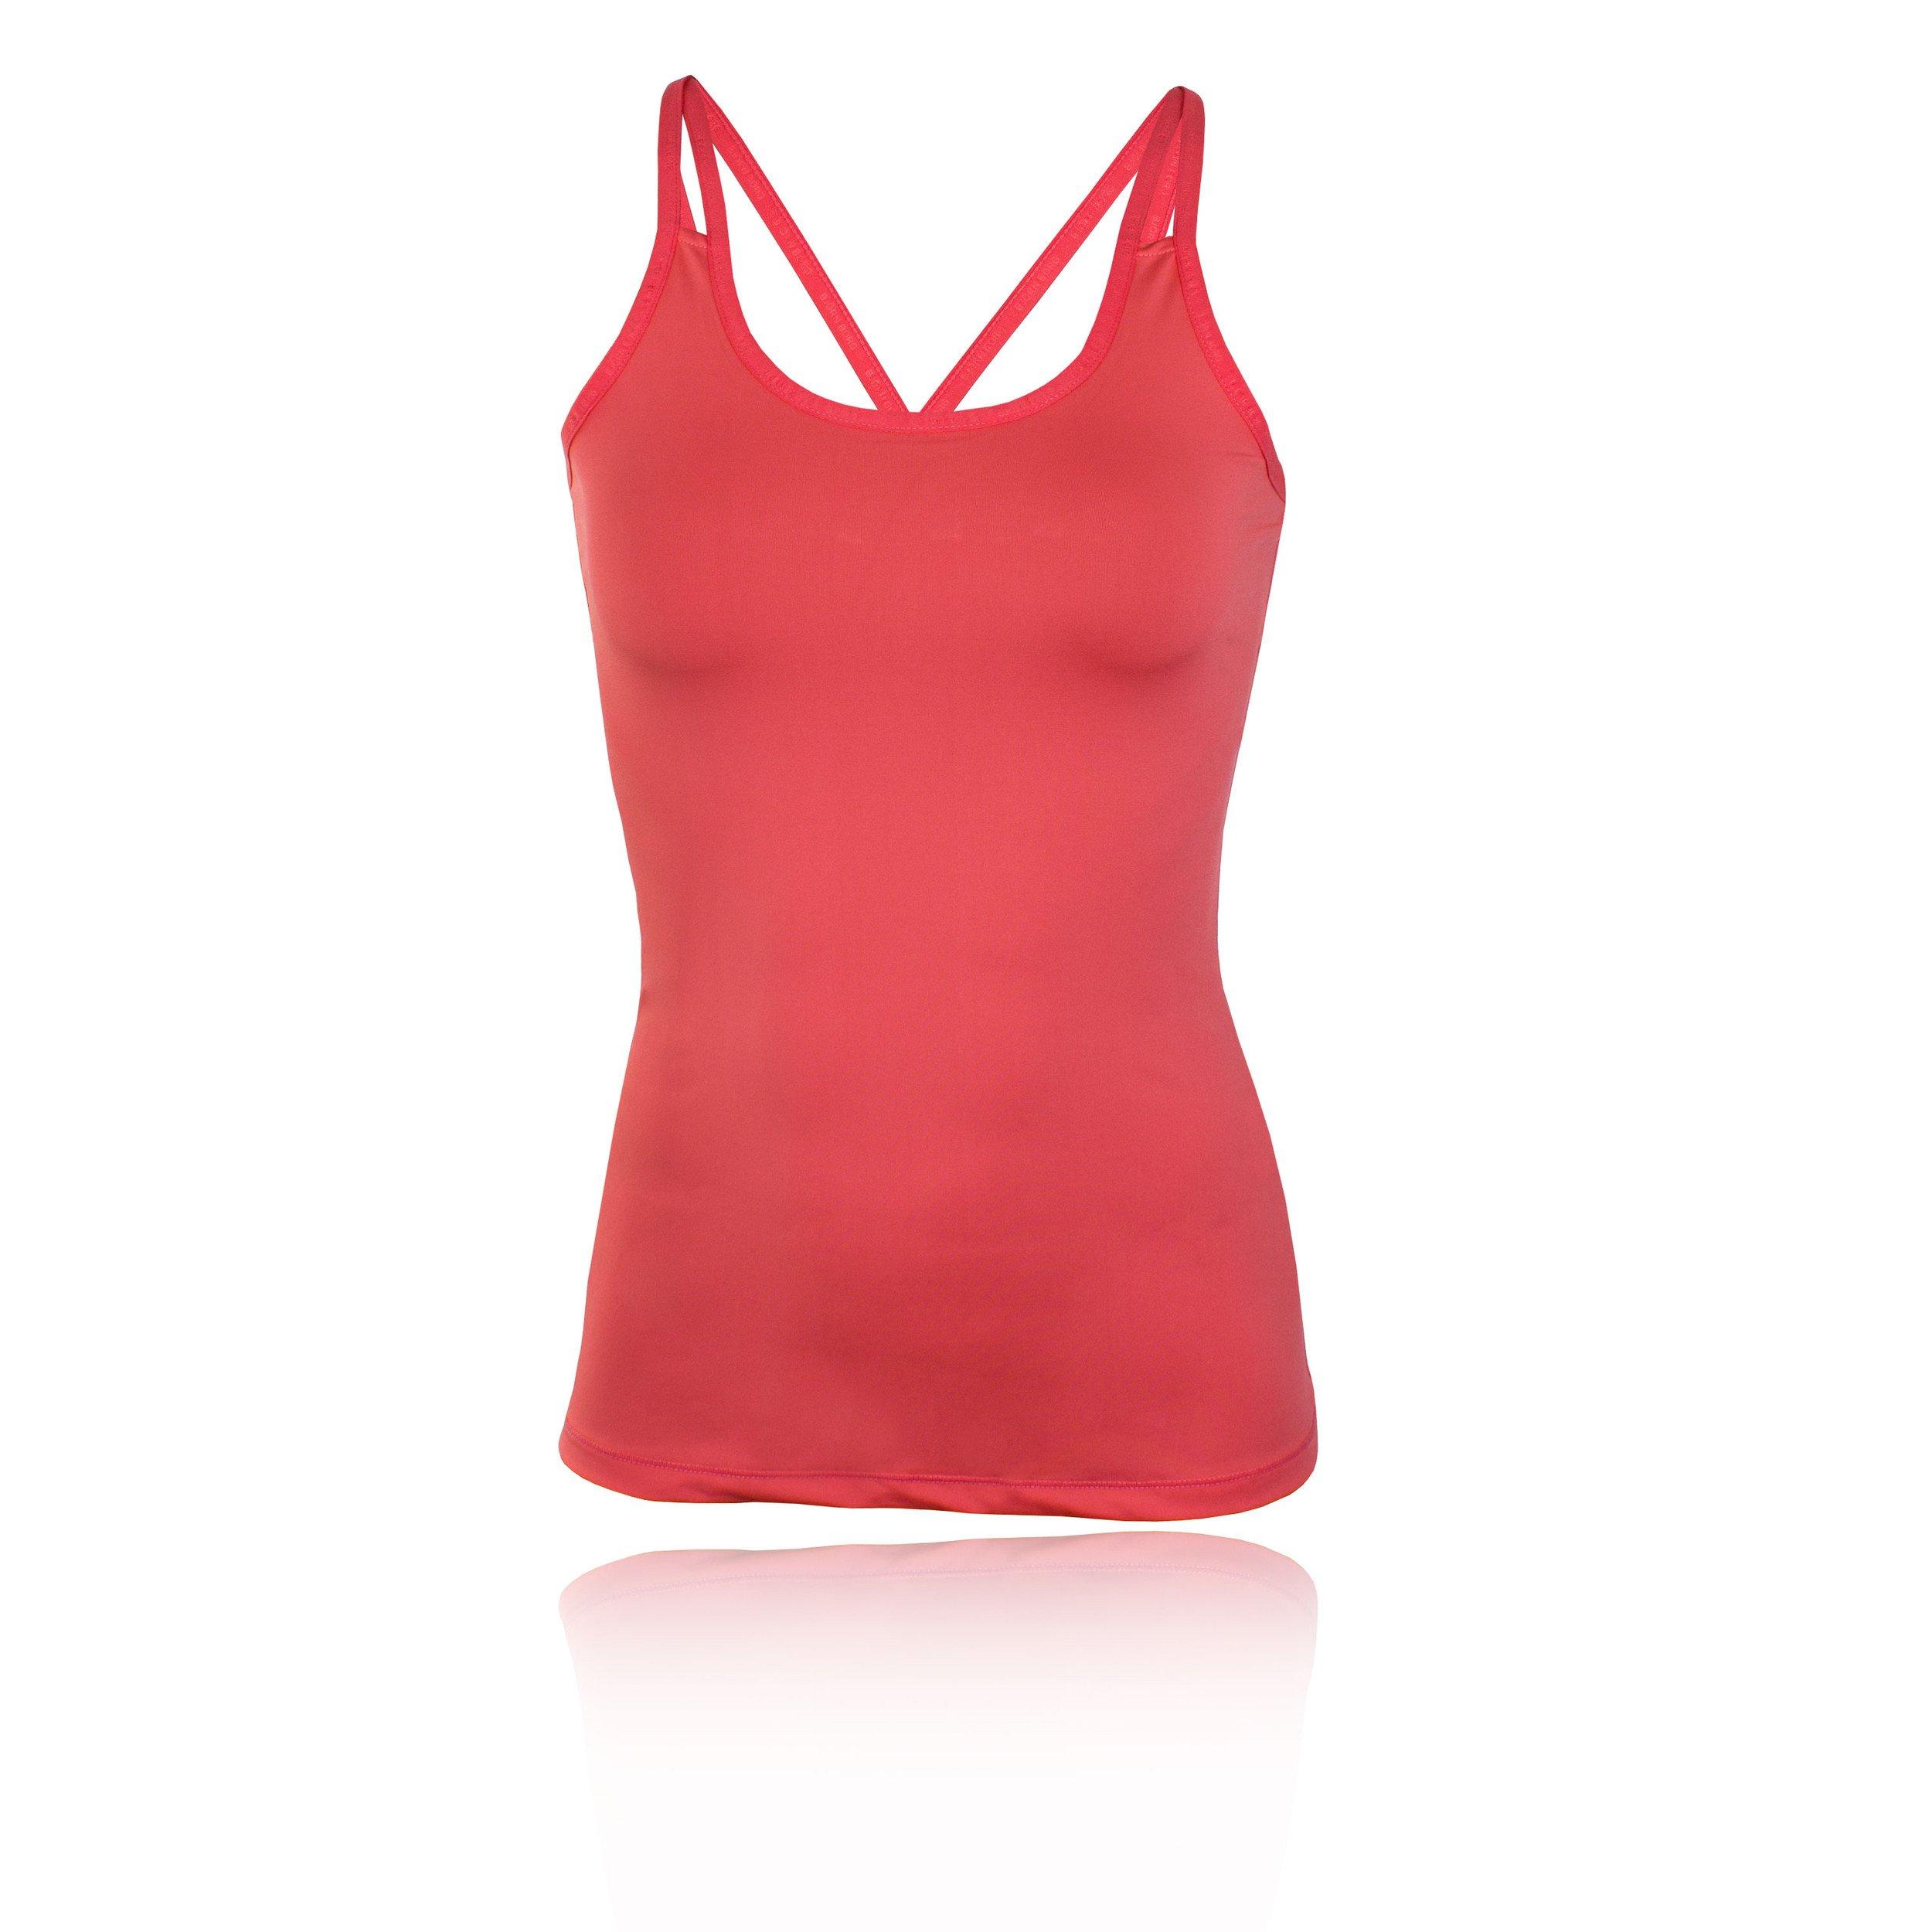 Bjorn Borg Women's Tula Top - Medium - Pink